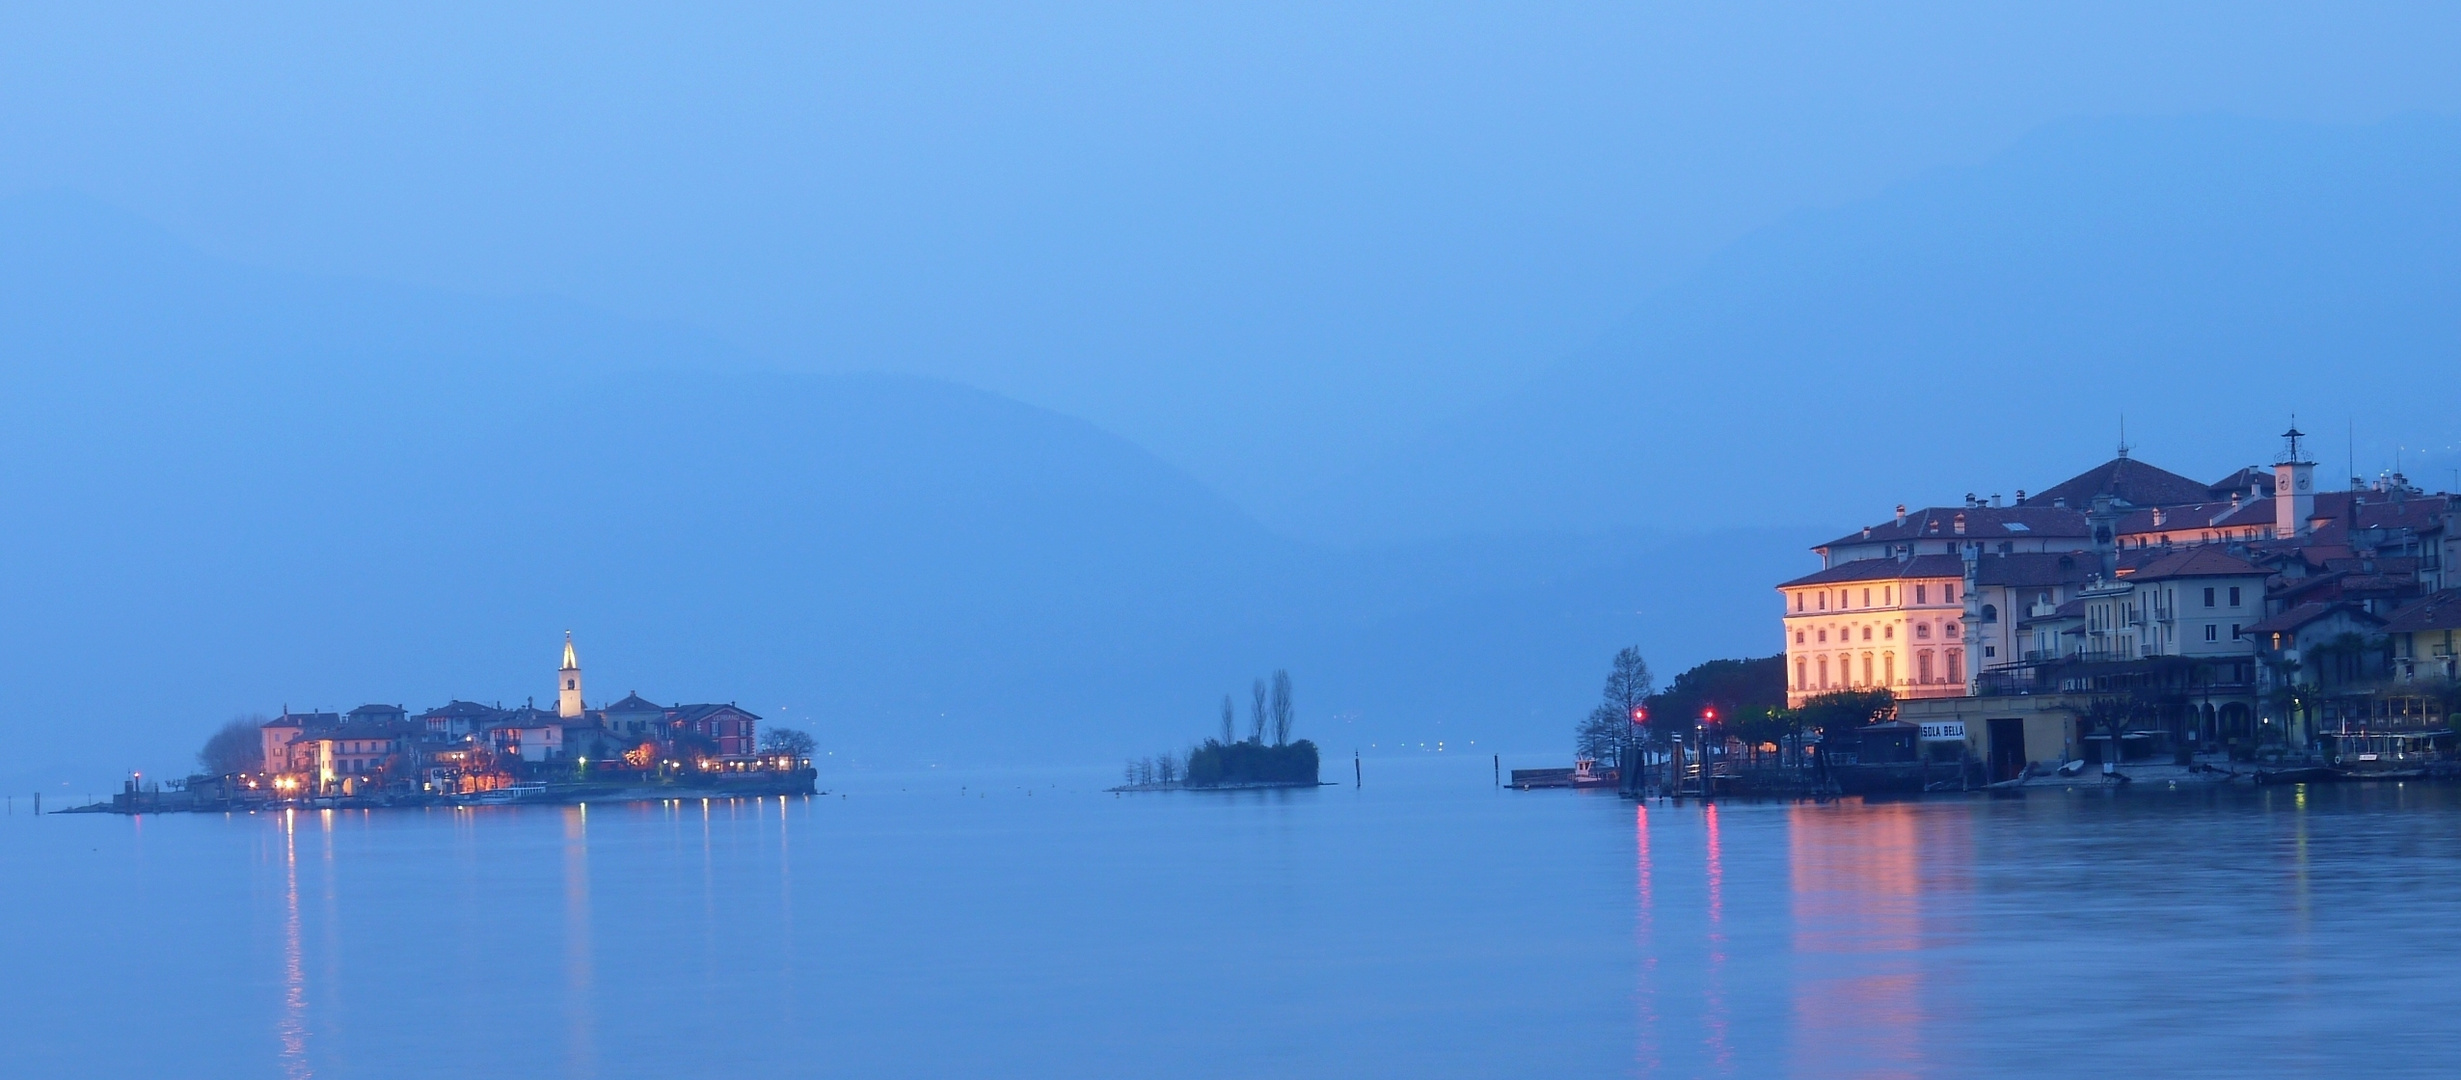 Lago Maggiore zur Blauen Stunde (Stresa)